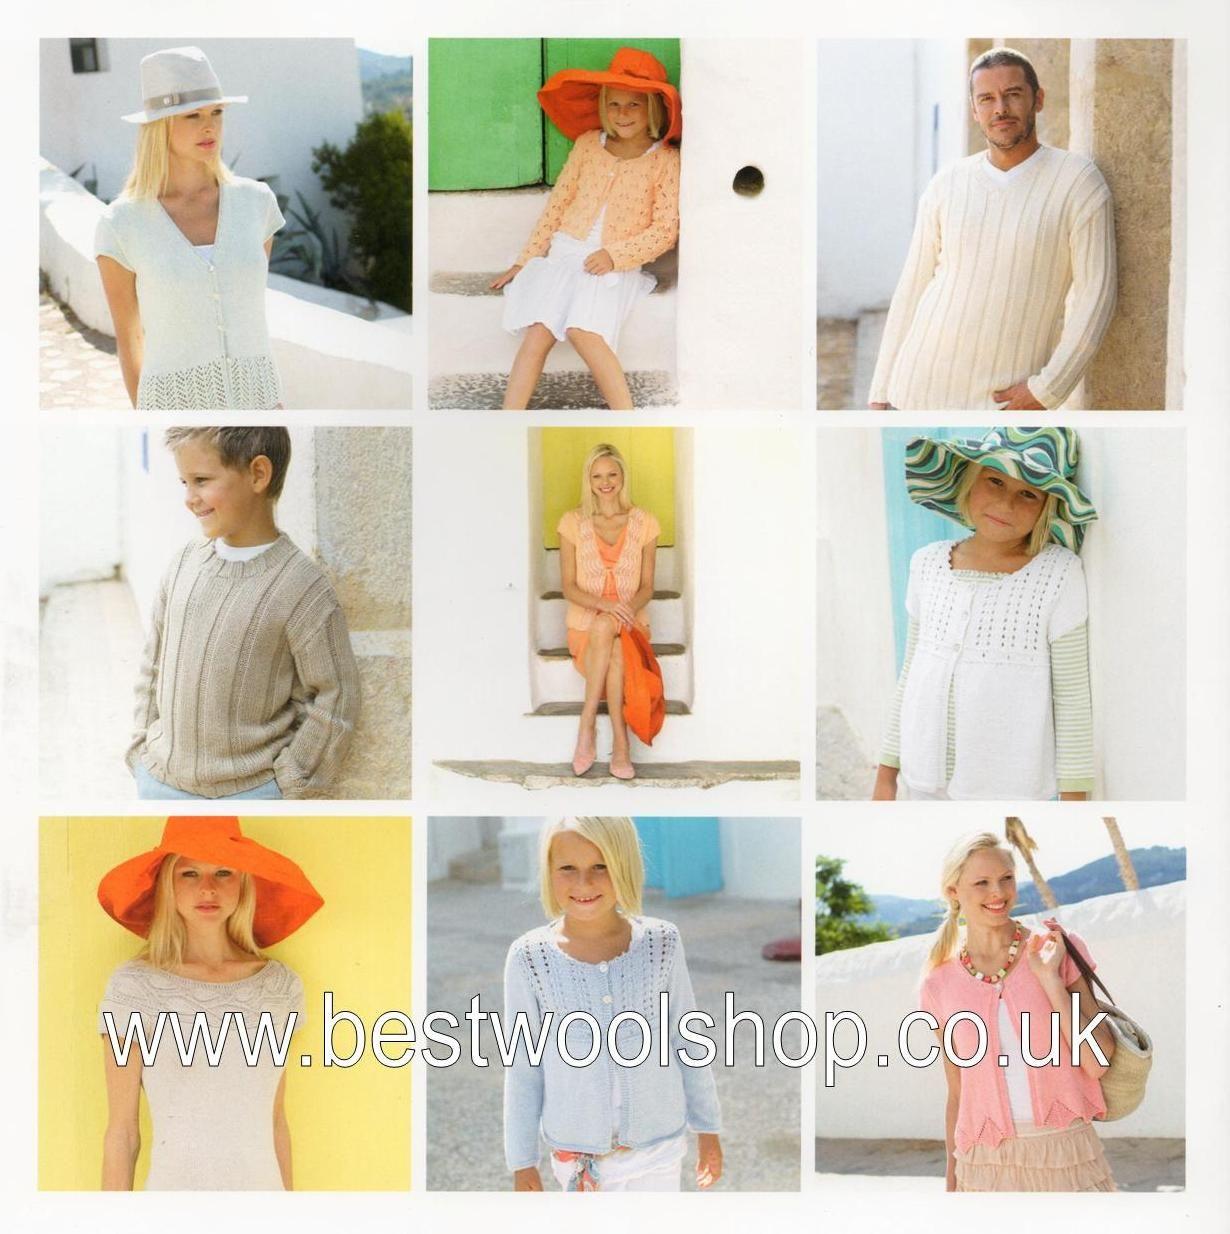 354 Sirdar Juicy Dk Knitting Pattern Booklet For Women Men Girls Boys